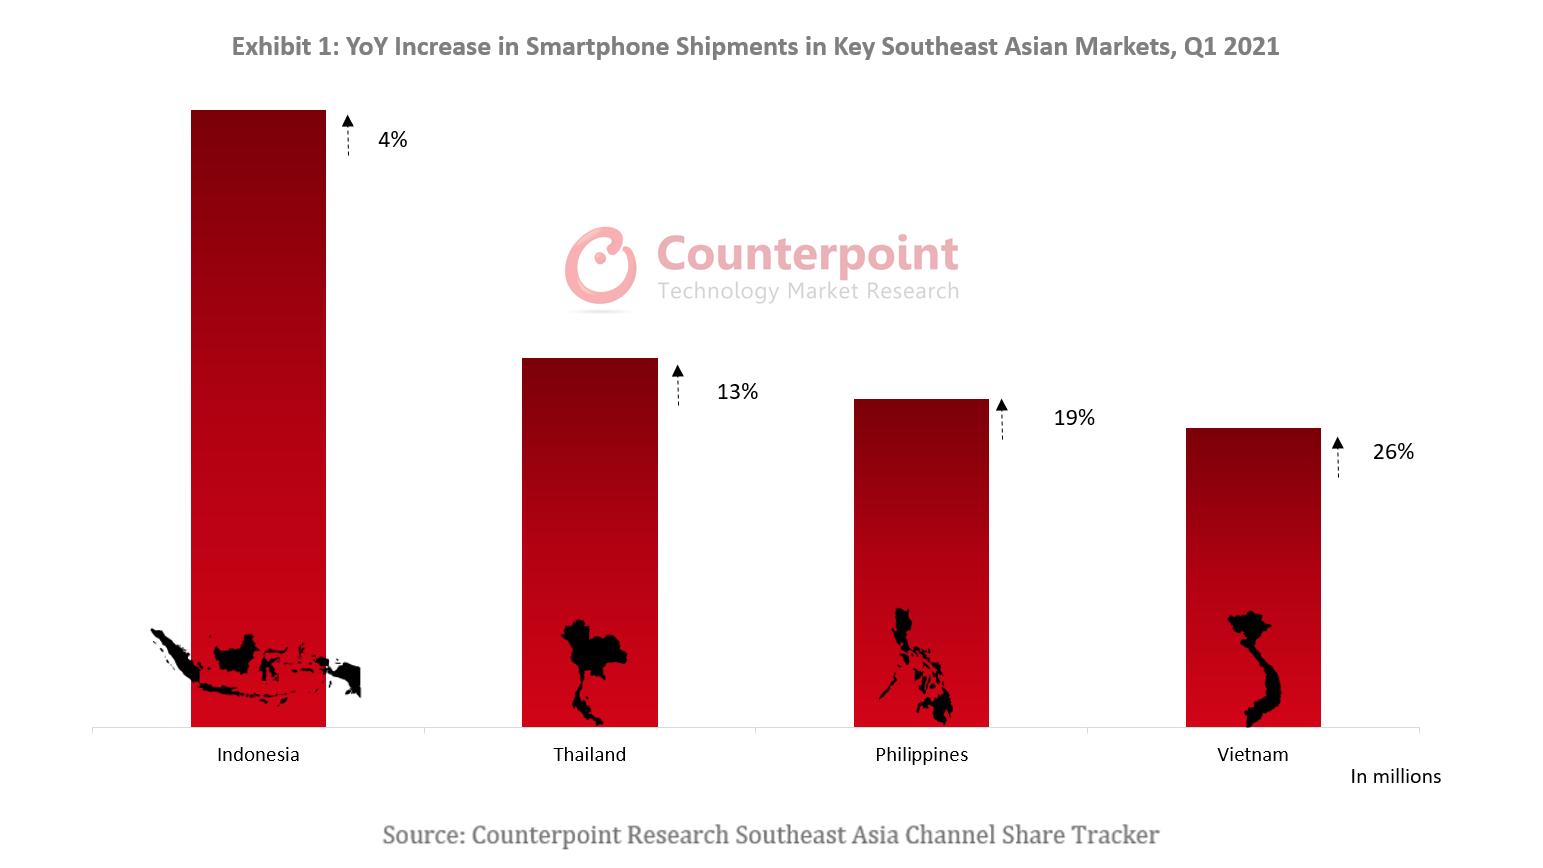 YoY Increase in Smartphone Shipments in Key Southeast Asian Markets, Q1 2021